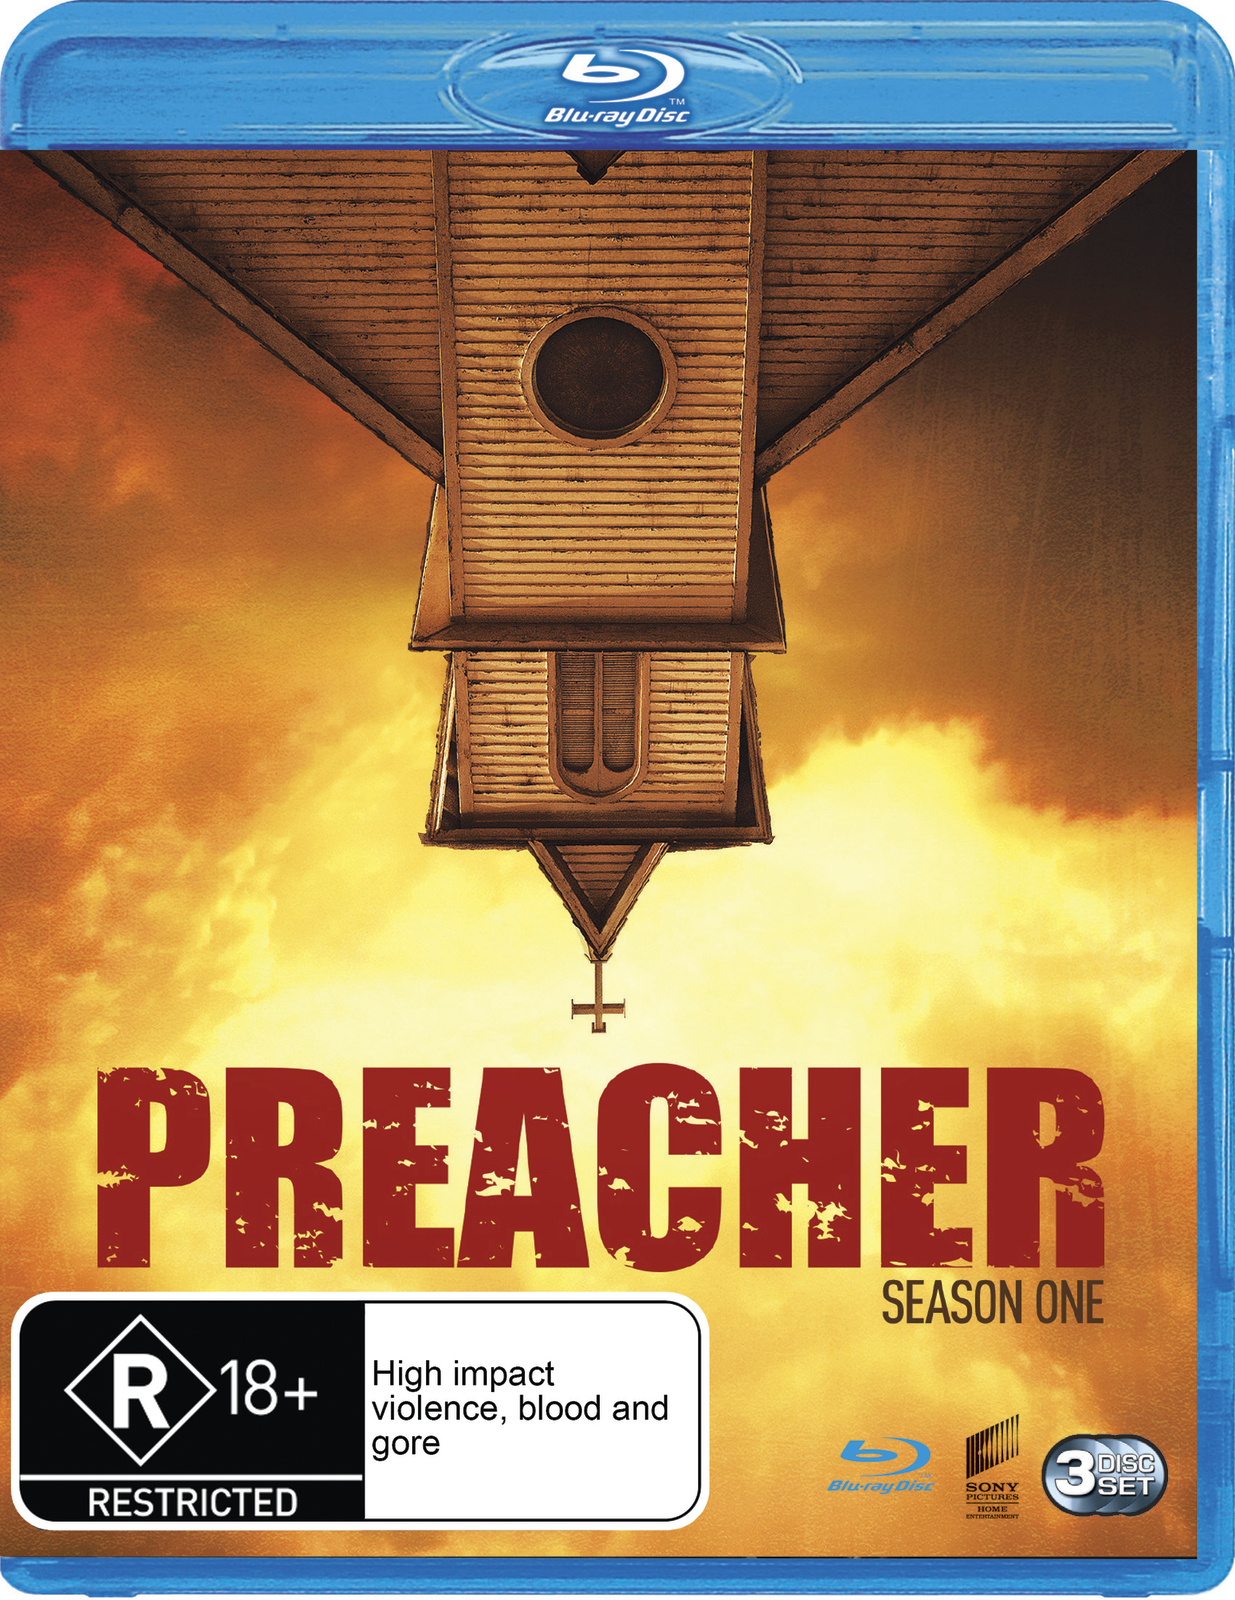 Preacher - Season One on Blu-ray image